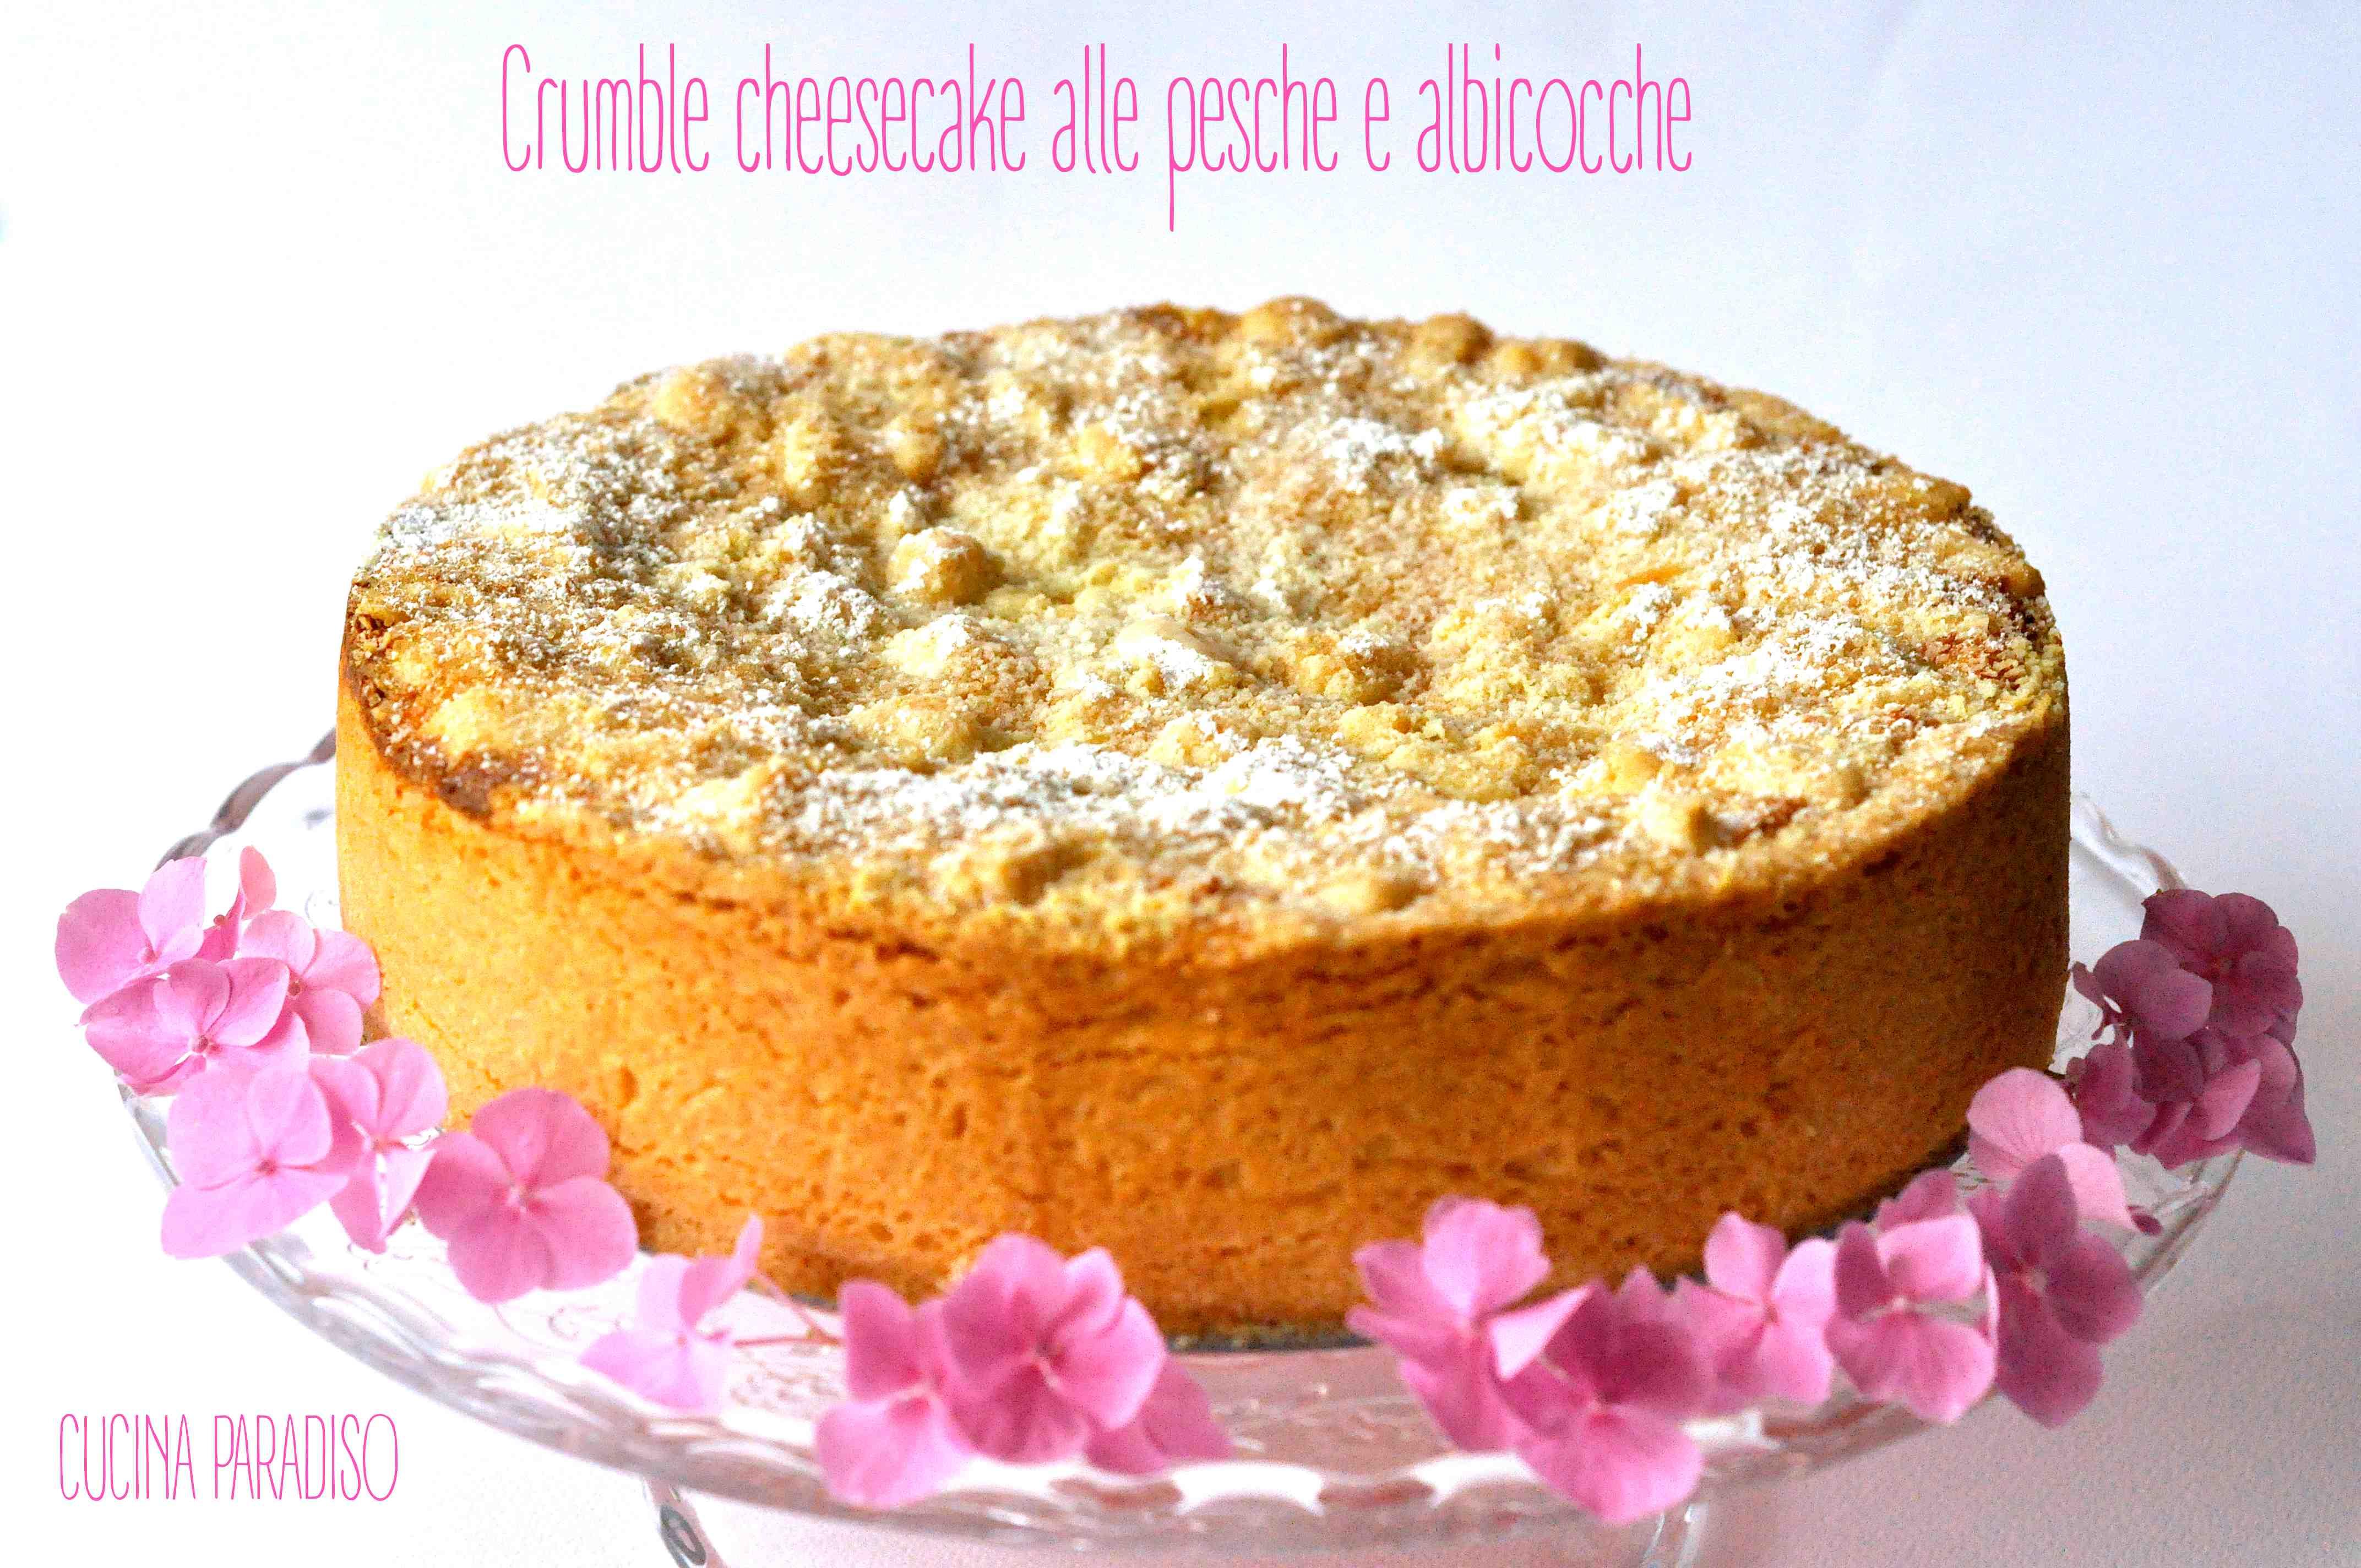 Crumble cheesecake alle pesche e albicocche2